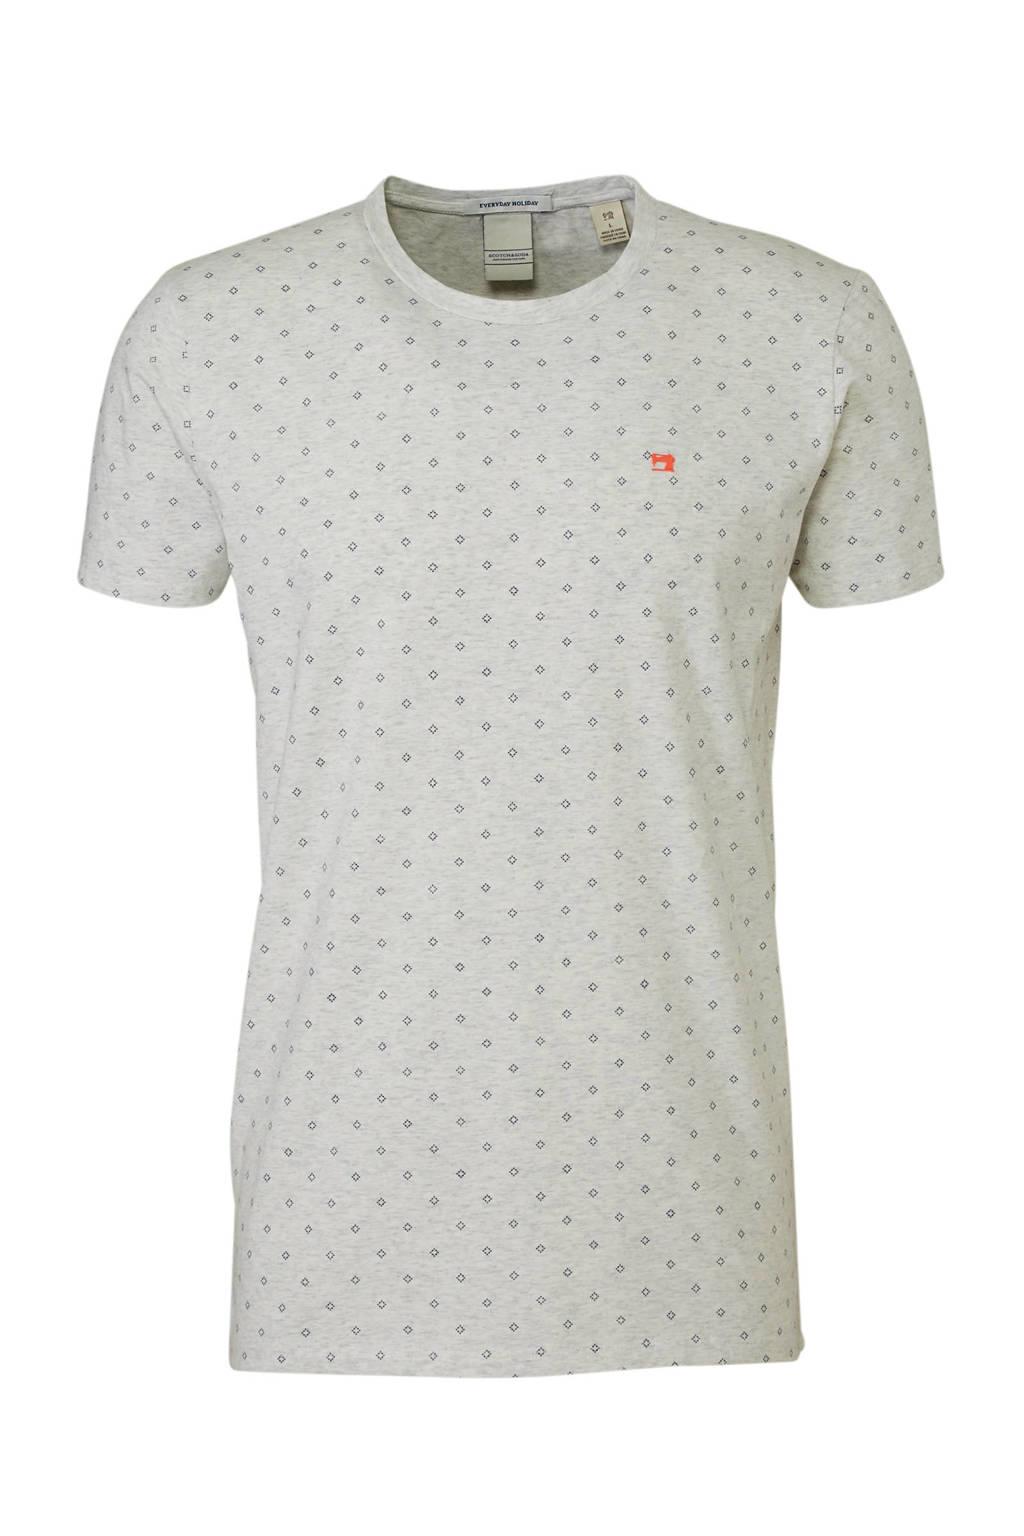 Scotch & Soda gemêleerd T-shirt met print grijs, Grijs